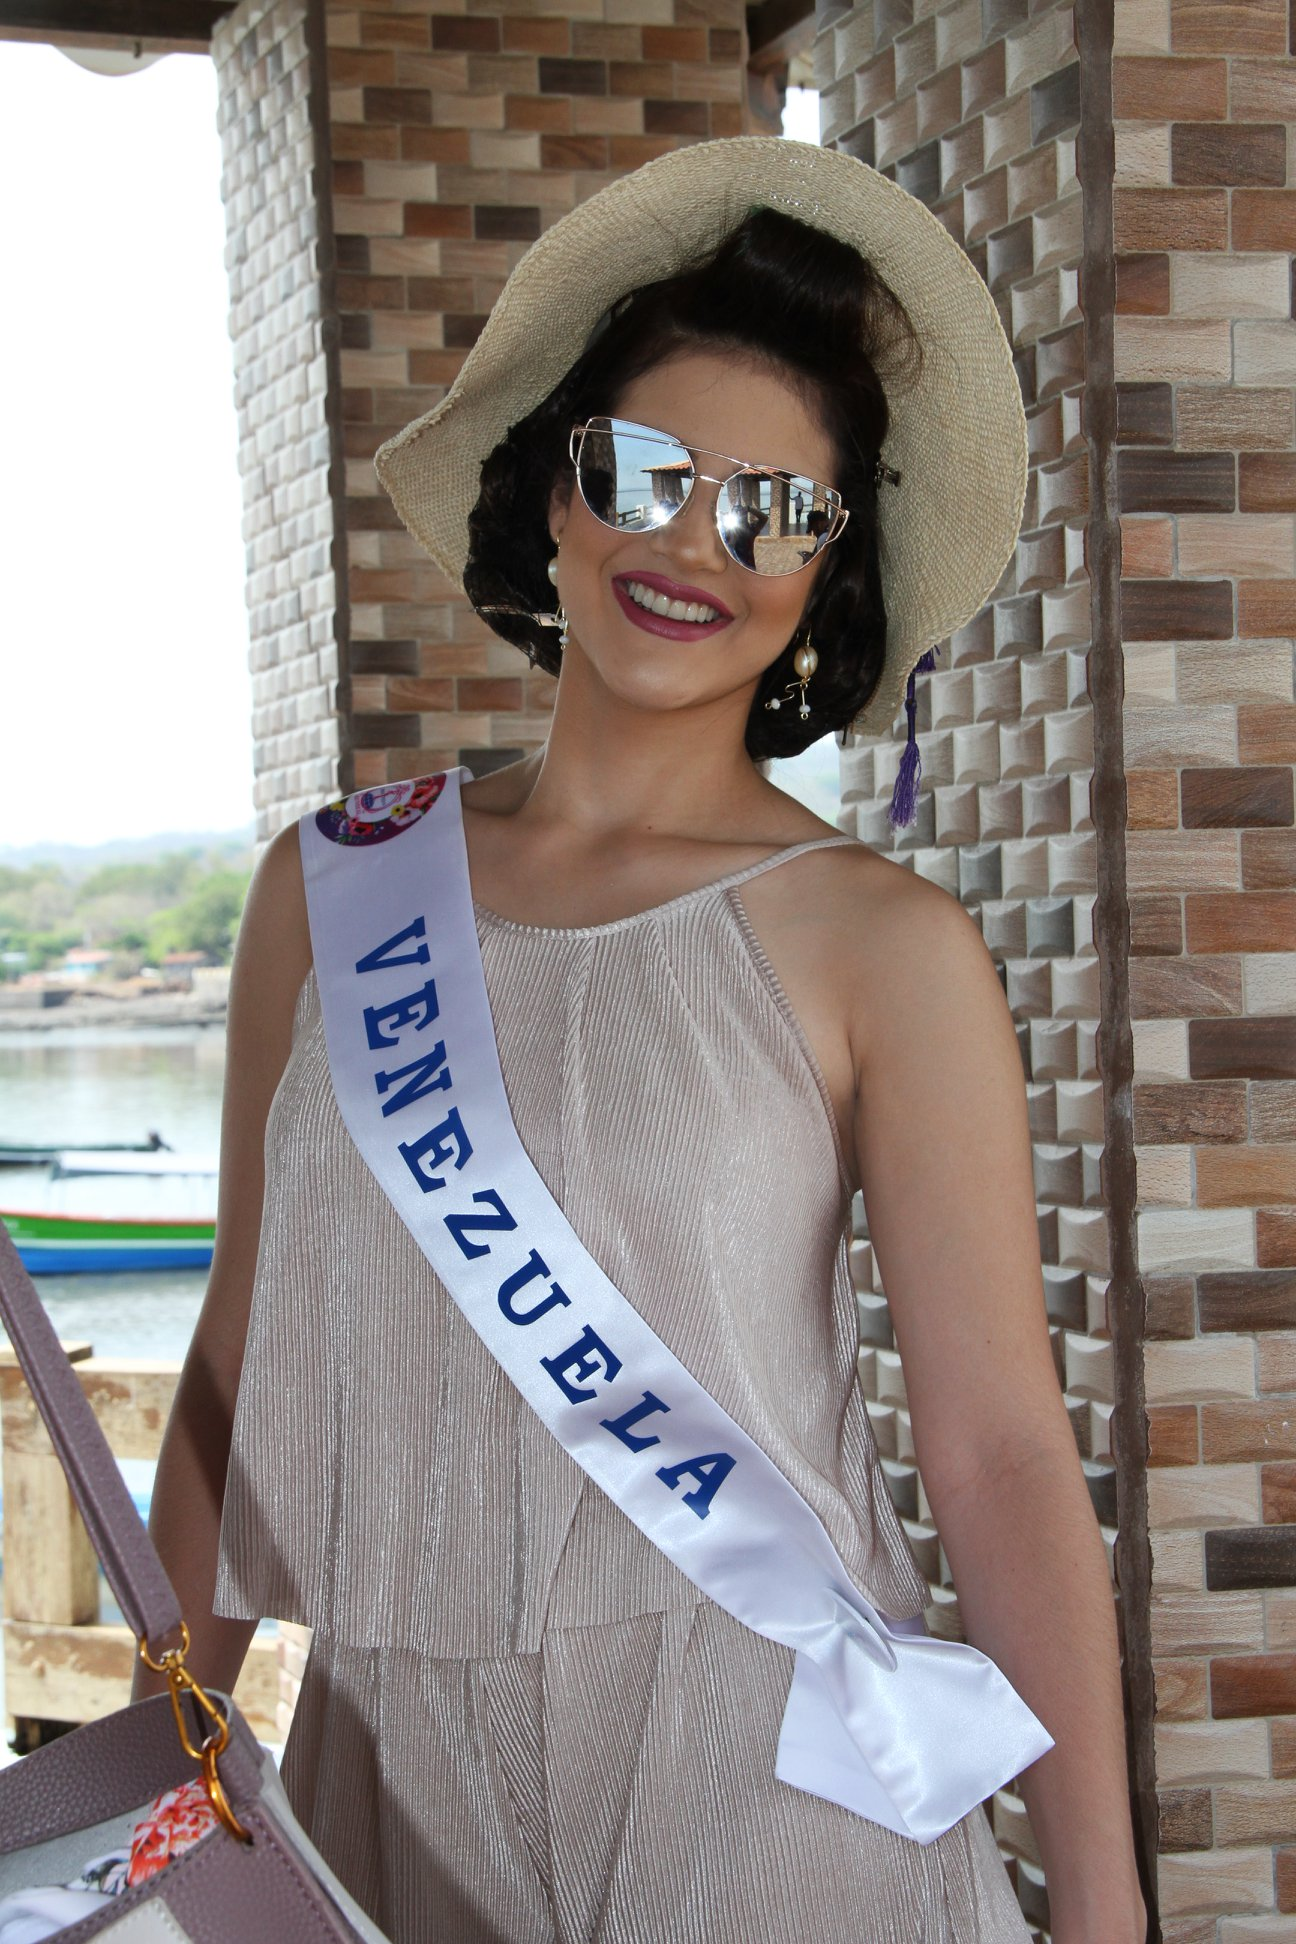 daniela di venere, top 12 de miss teen mundial 2019. - Página 4 60496110